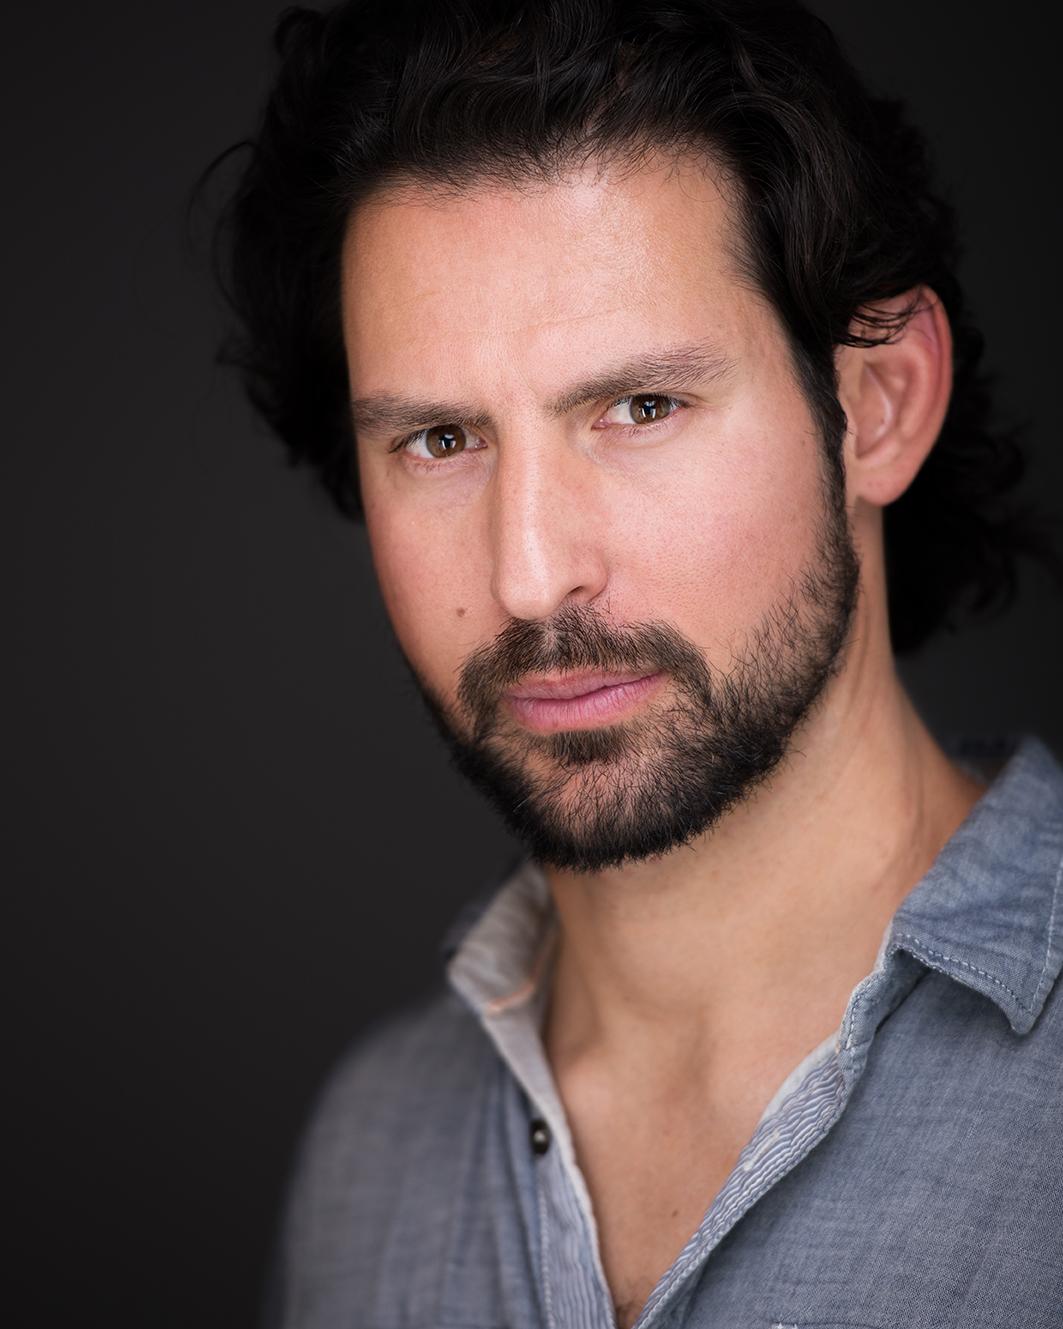 Jonathan Libman, Director and Playwright